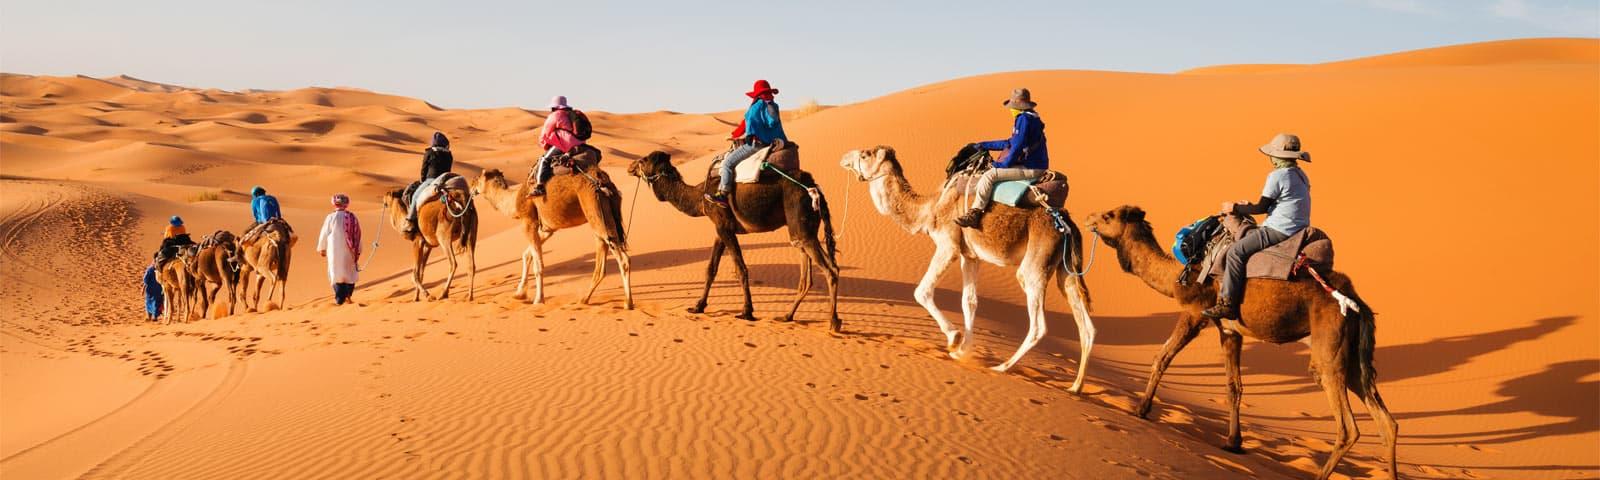 Morocco-Vacation-Tour-Sahara-Desert-Tour-Morocco-Tours